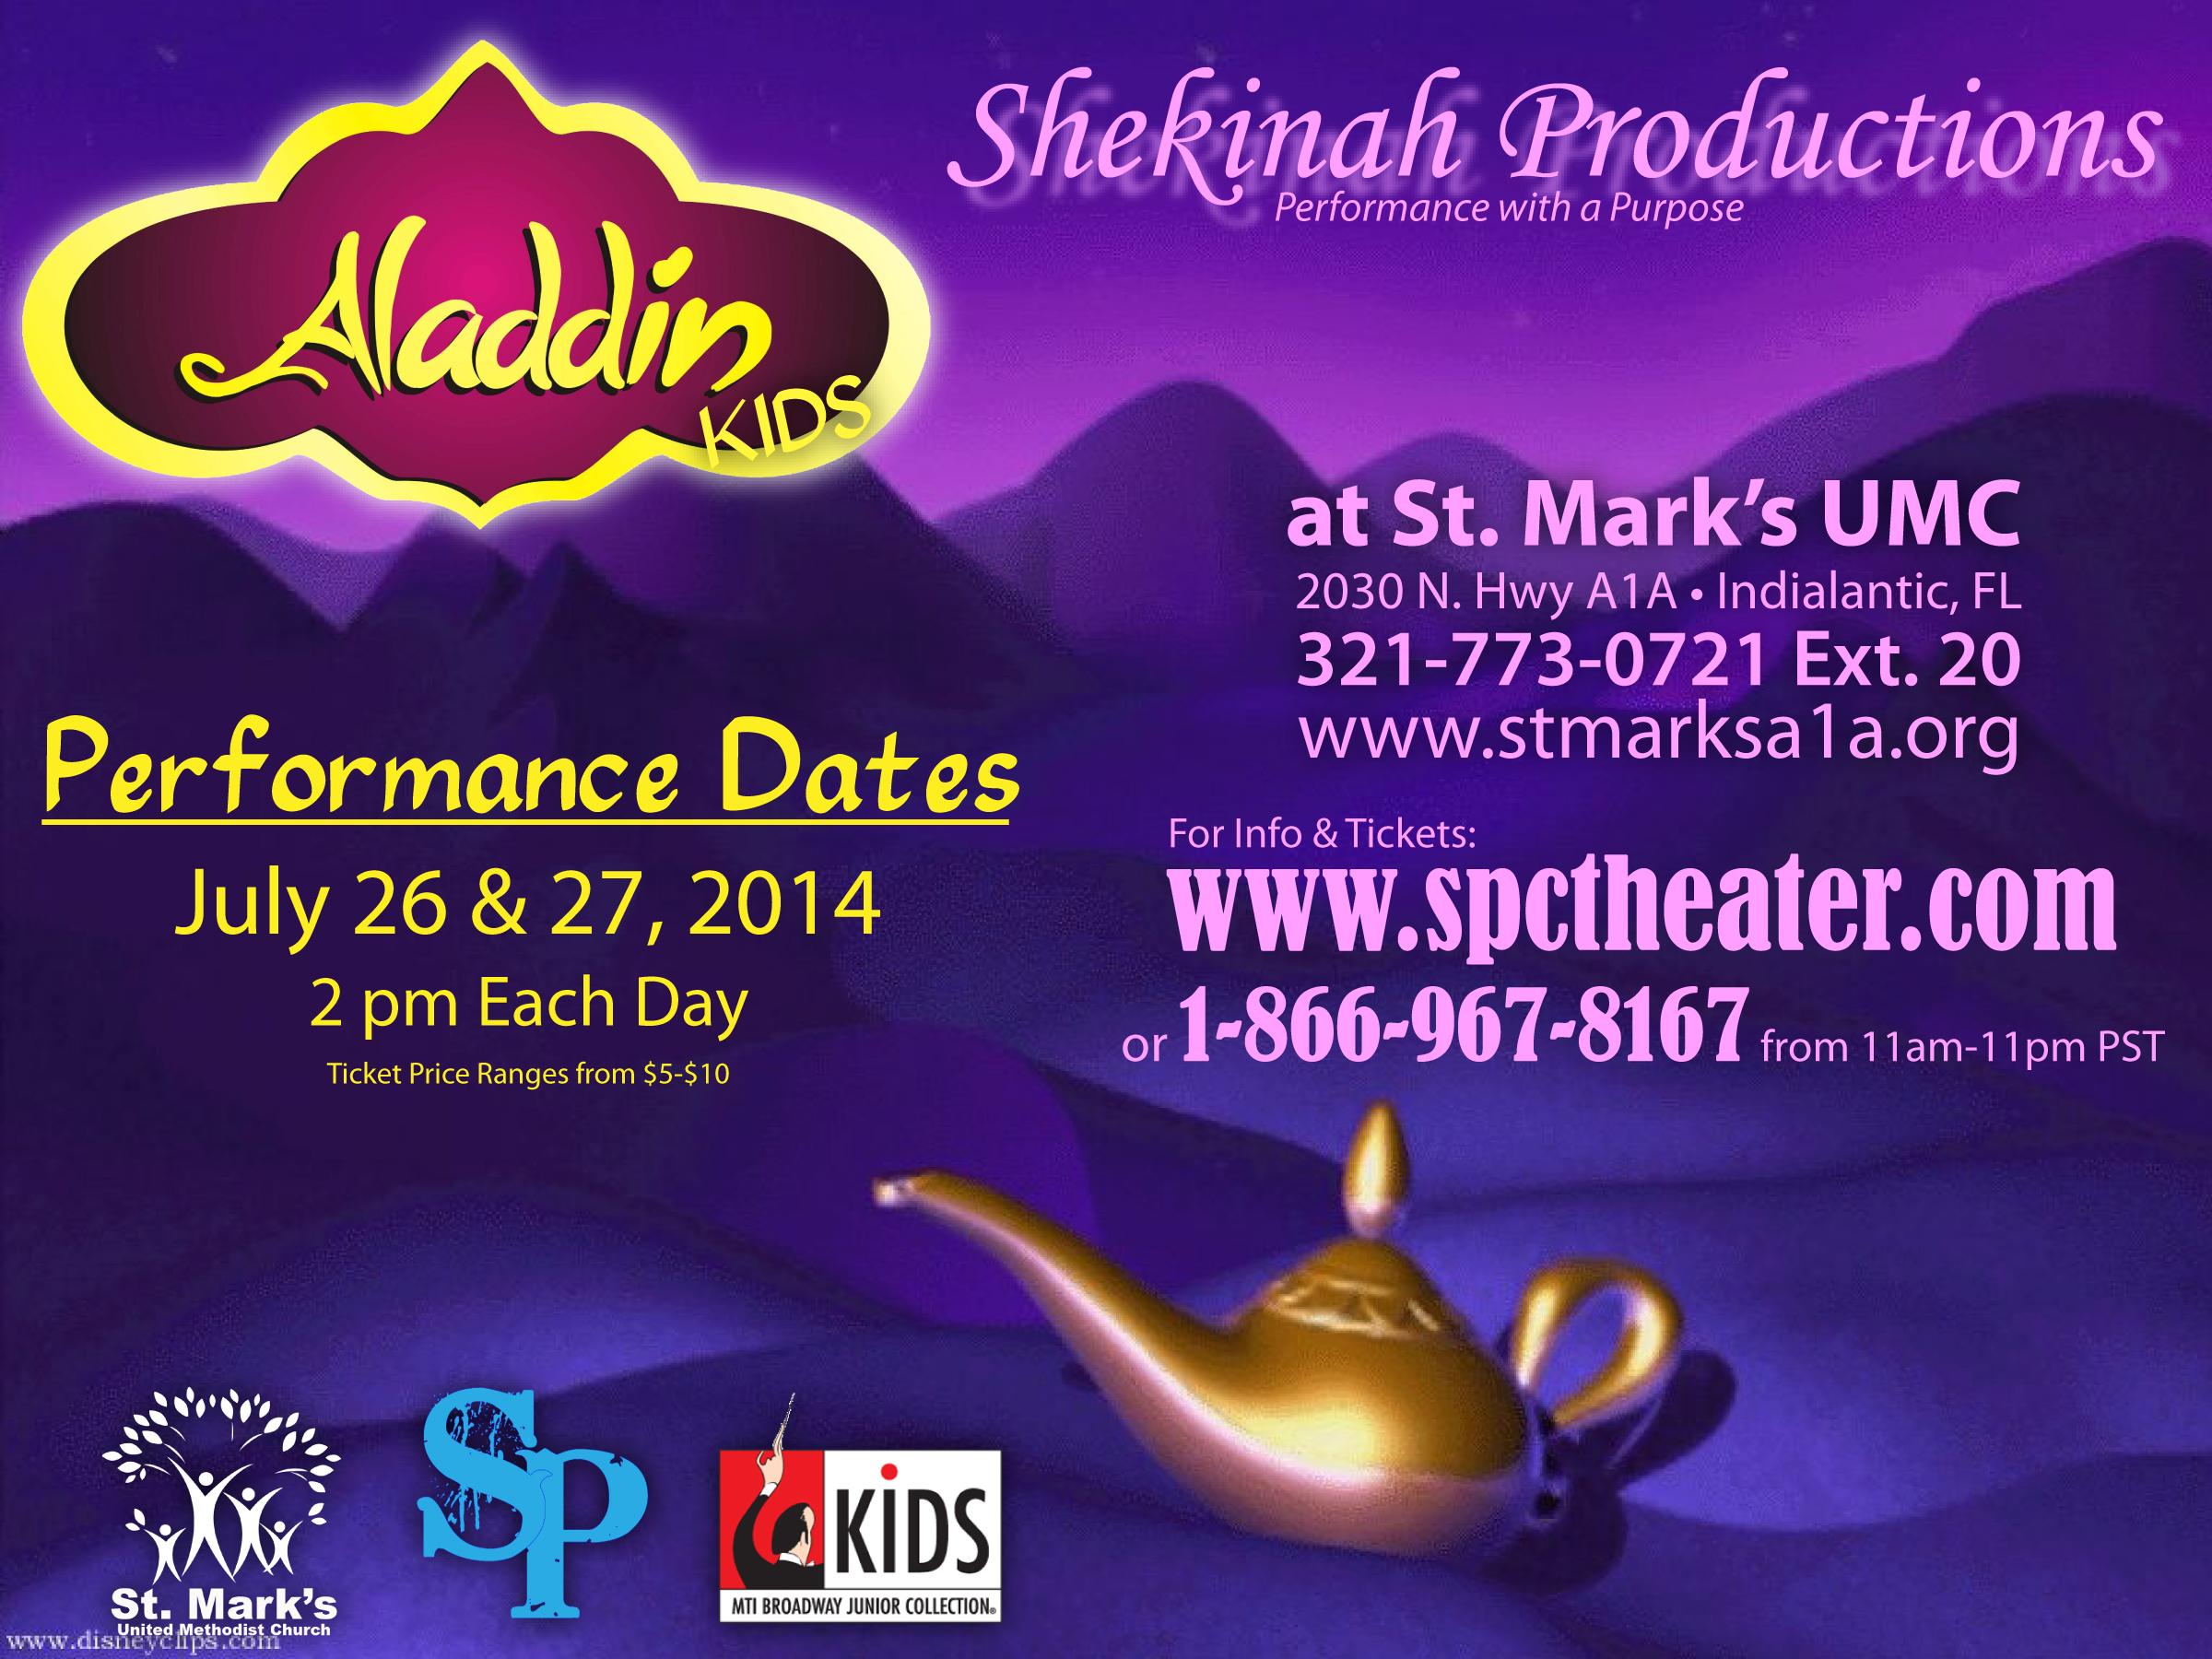 Web-Aladdin-KIDS-Performance.jpg